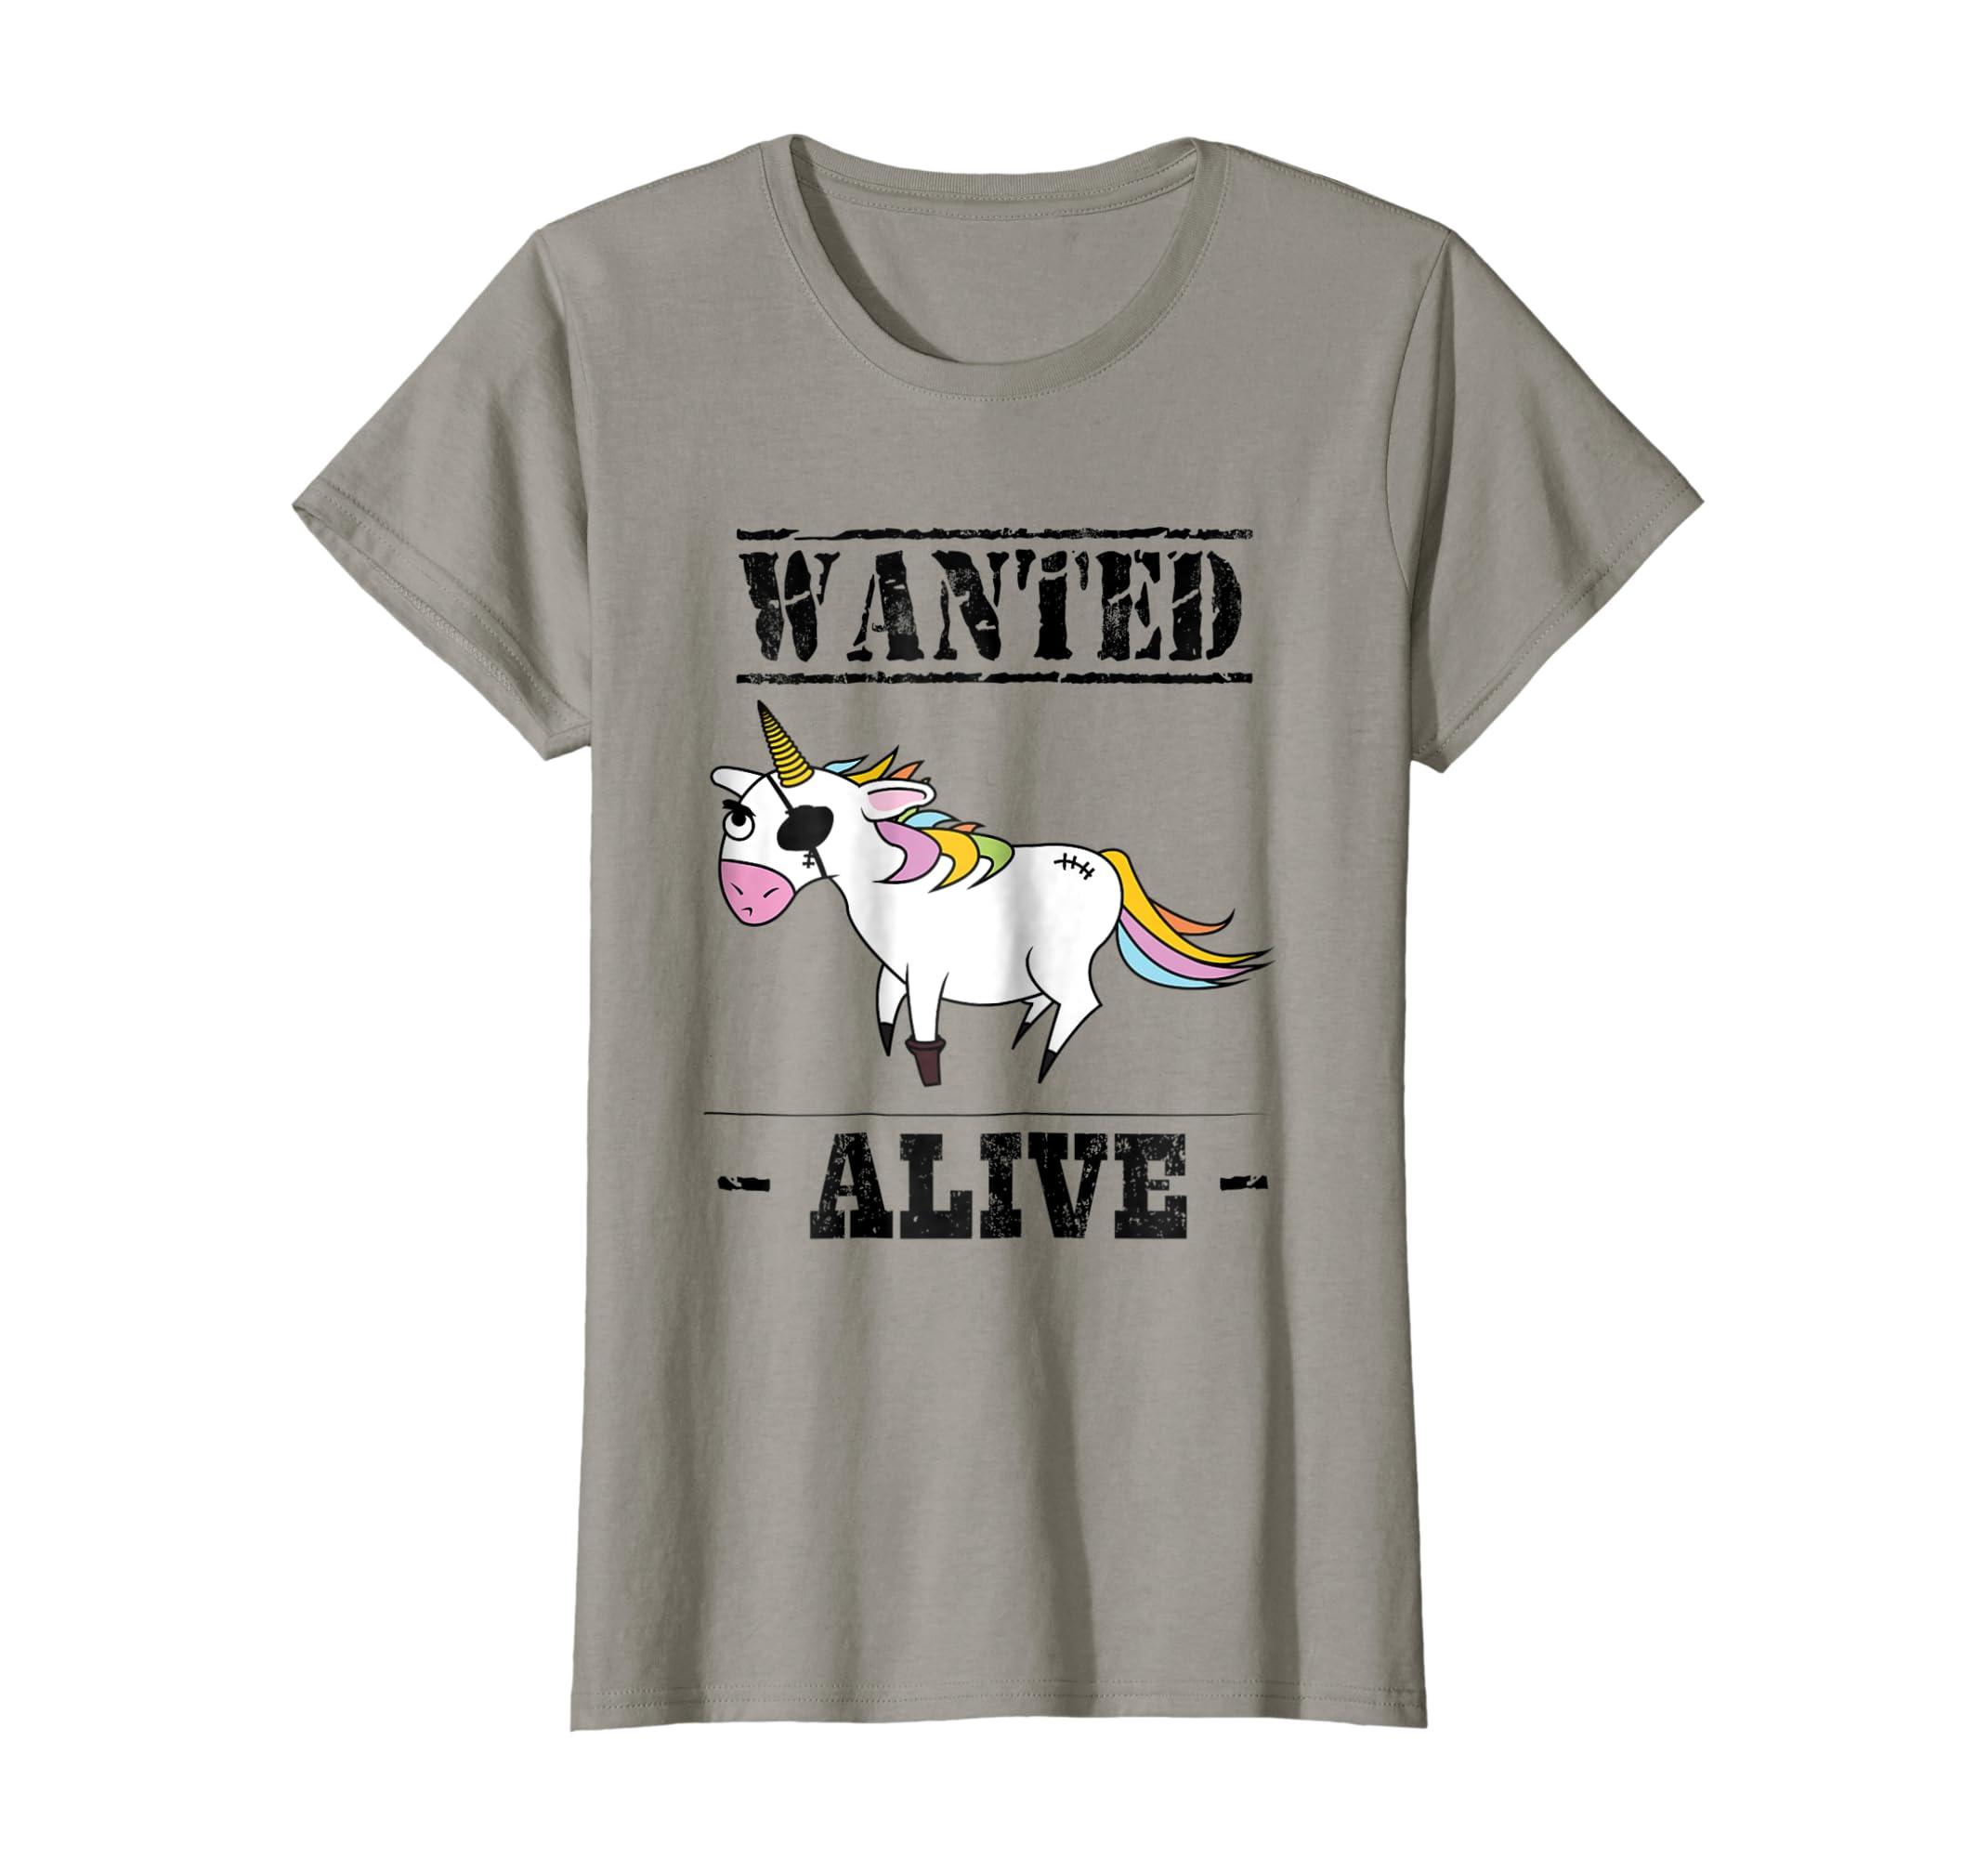 c41a143952 Amazon.com: Funny Unicorn T Shirt Cute Wanted Unicorn Alive Kids Adults:  Clothing